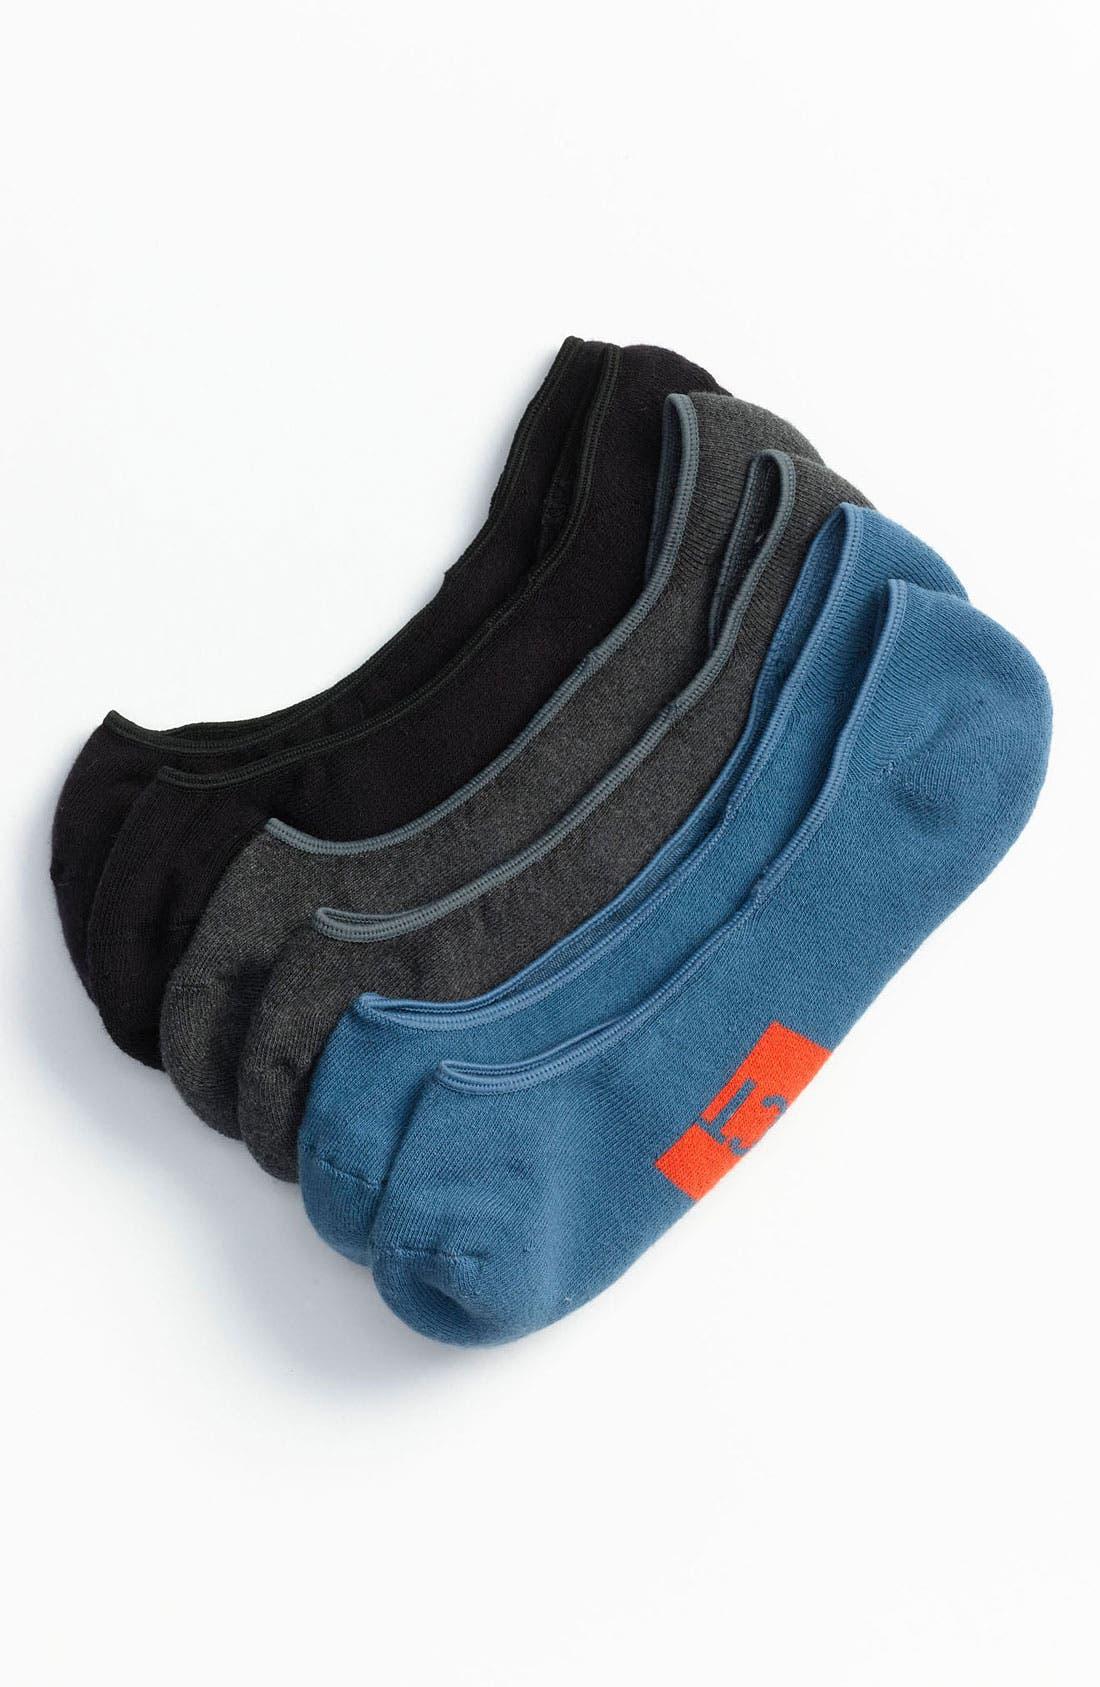 Alternate Image 1 Selected - Pact No-Show Socks (3-Pack) (Men)